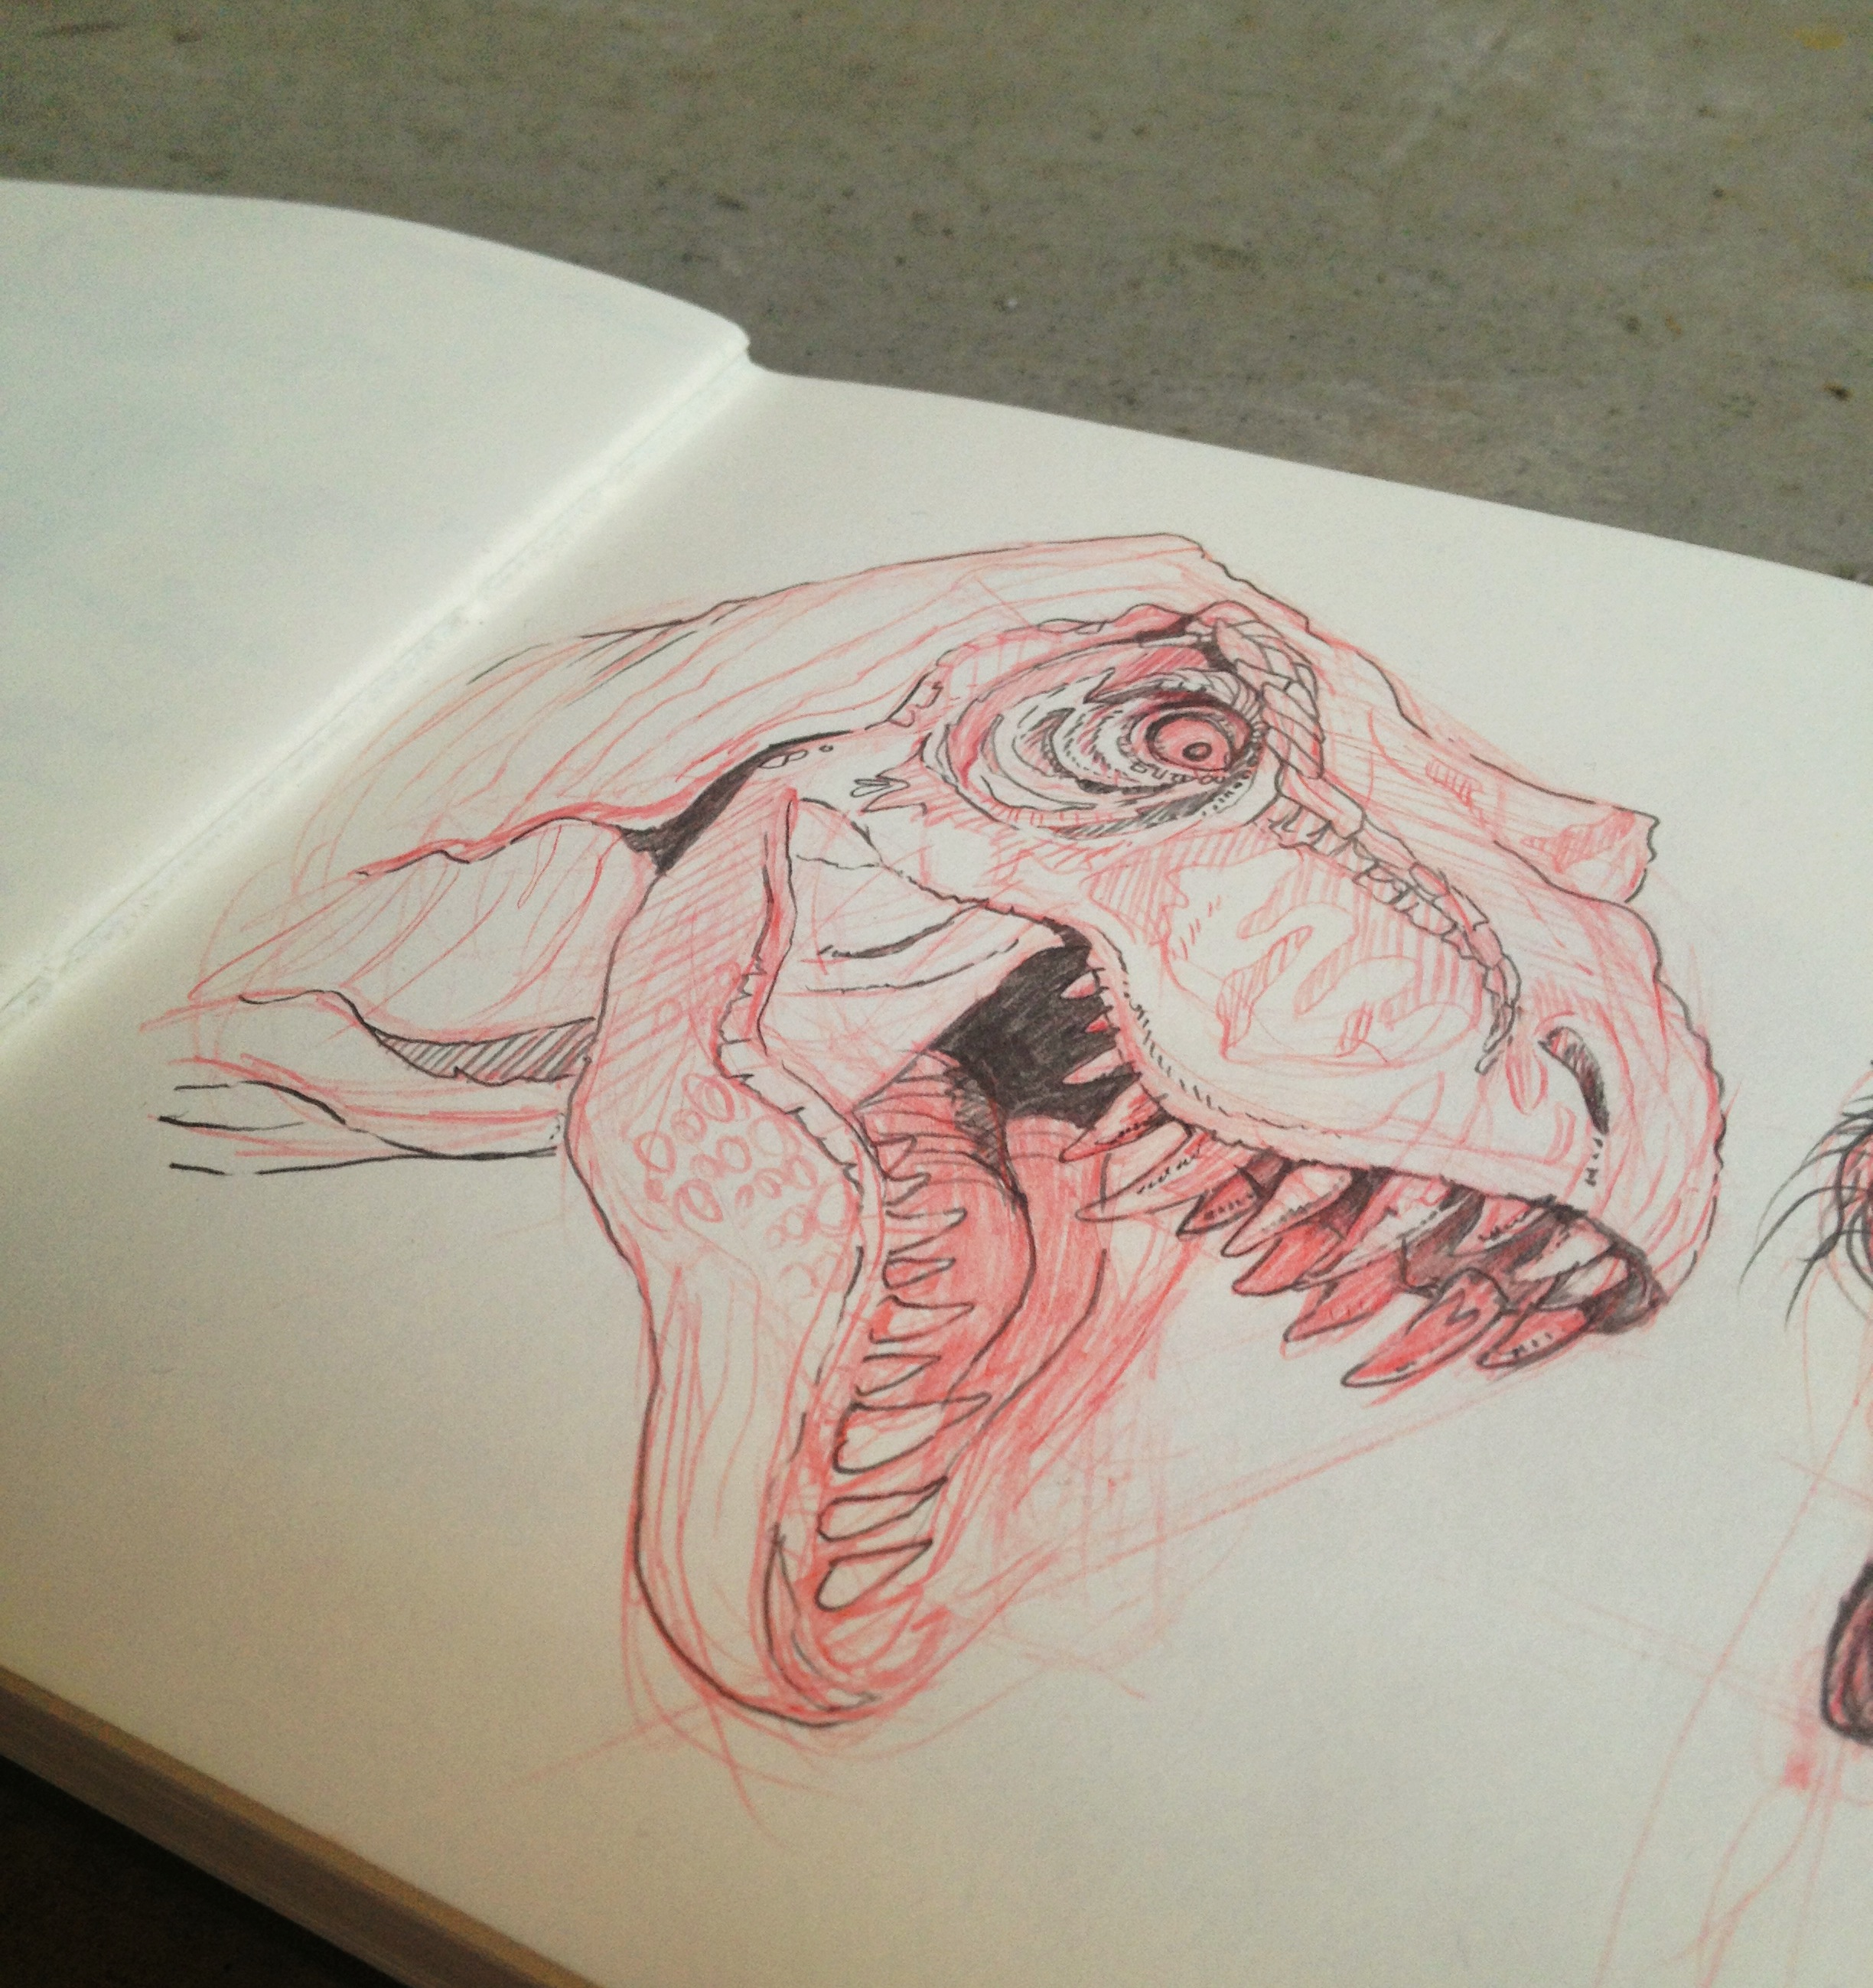 Sketch of T-Rex by Chloe Yingst | chloedraws.com